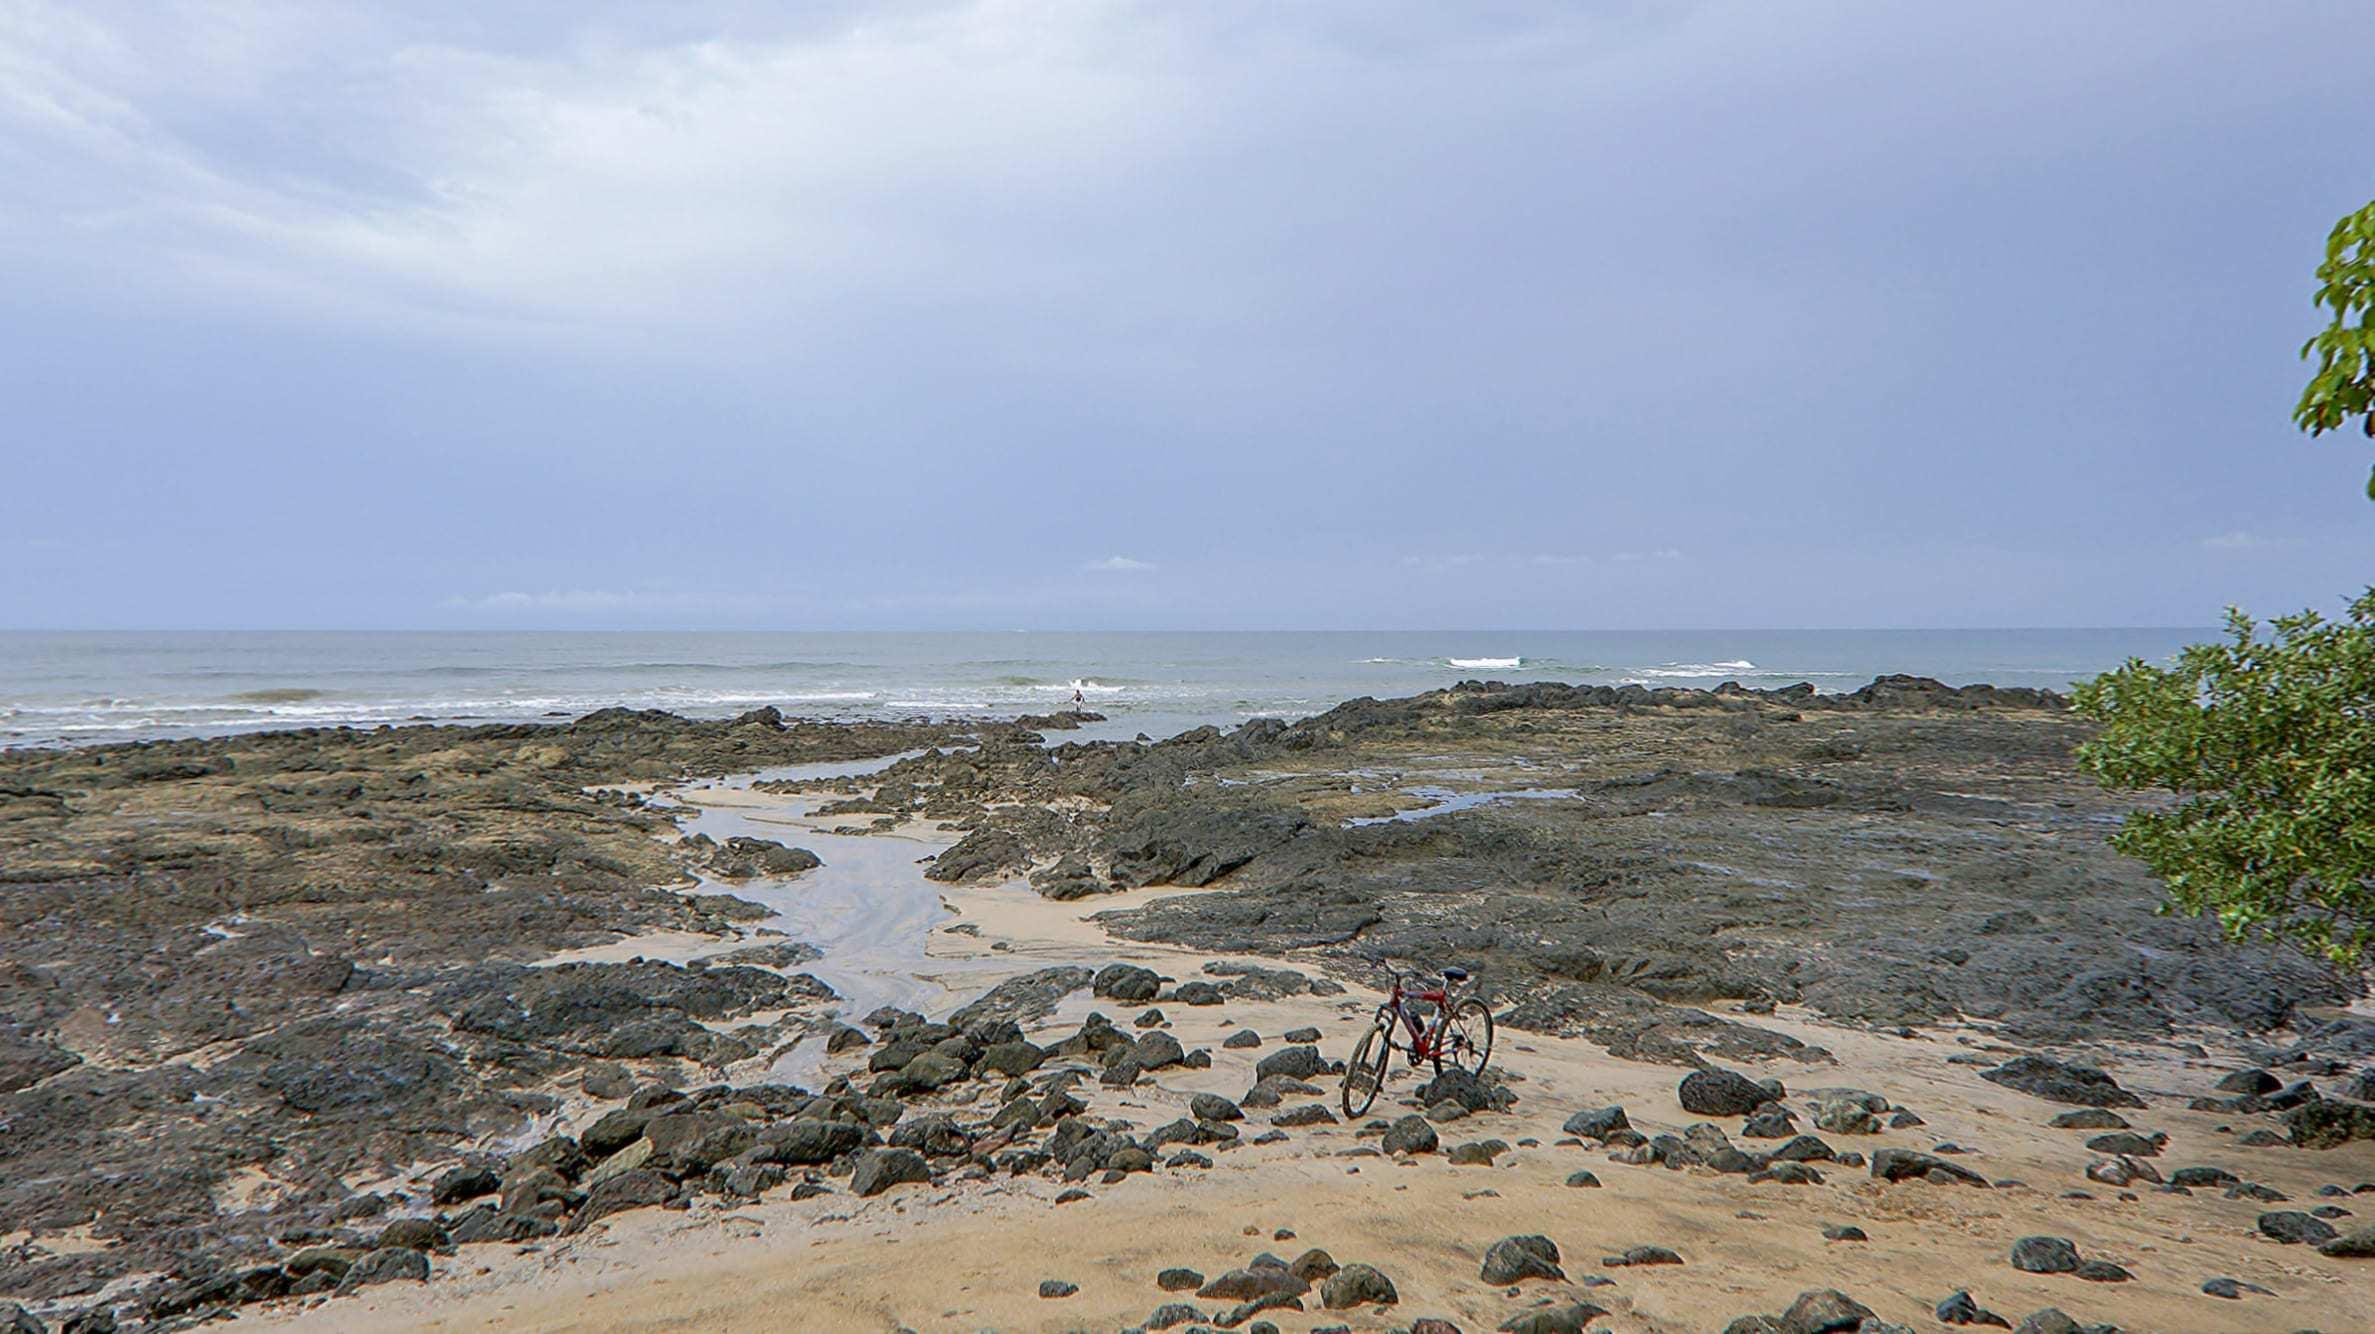 BL Common - Beach